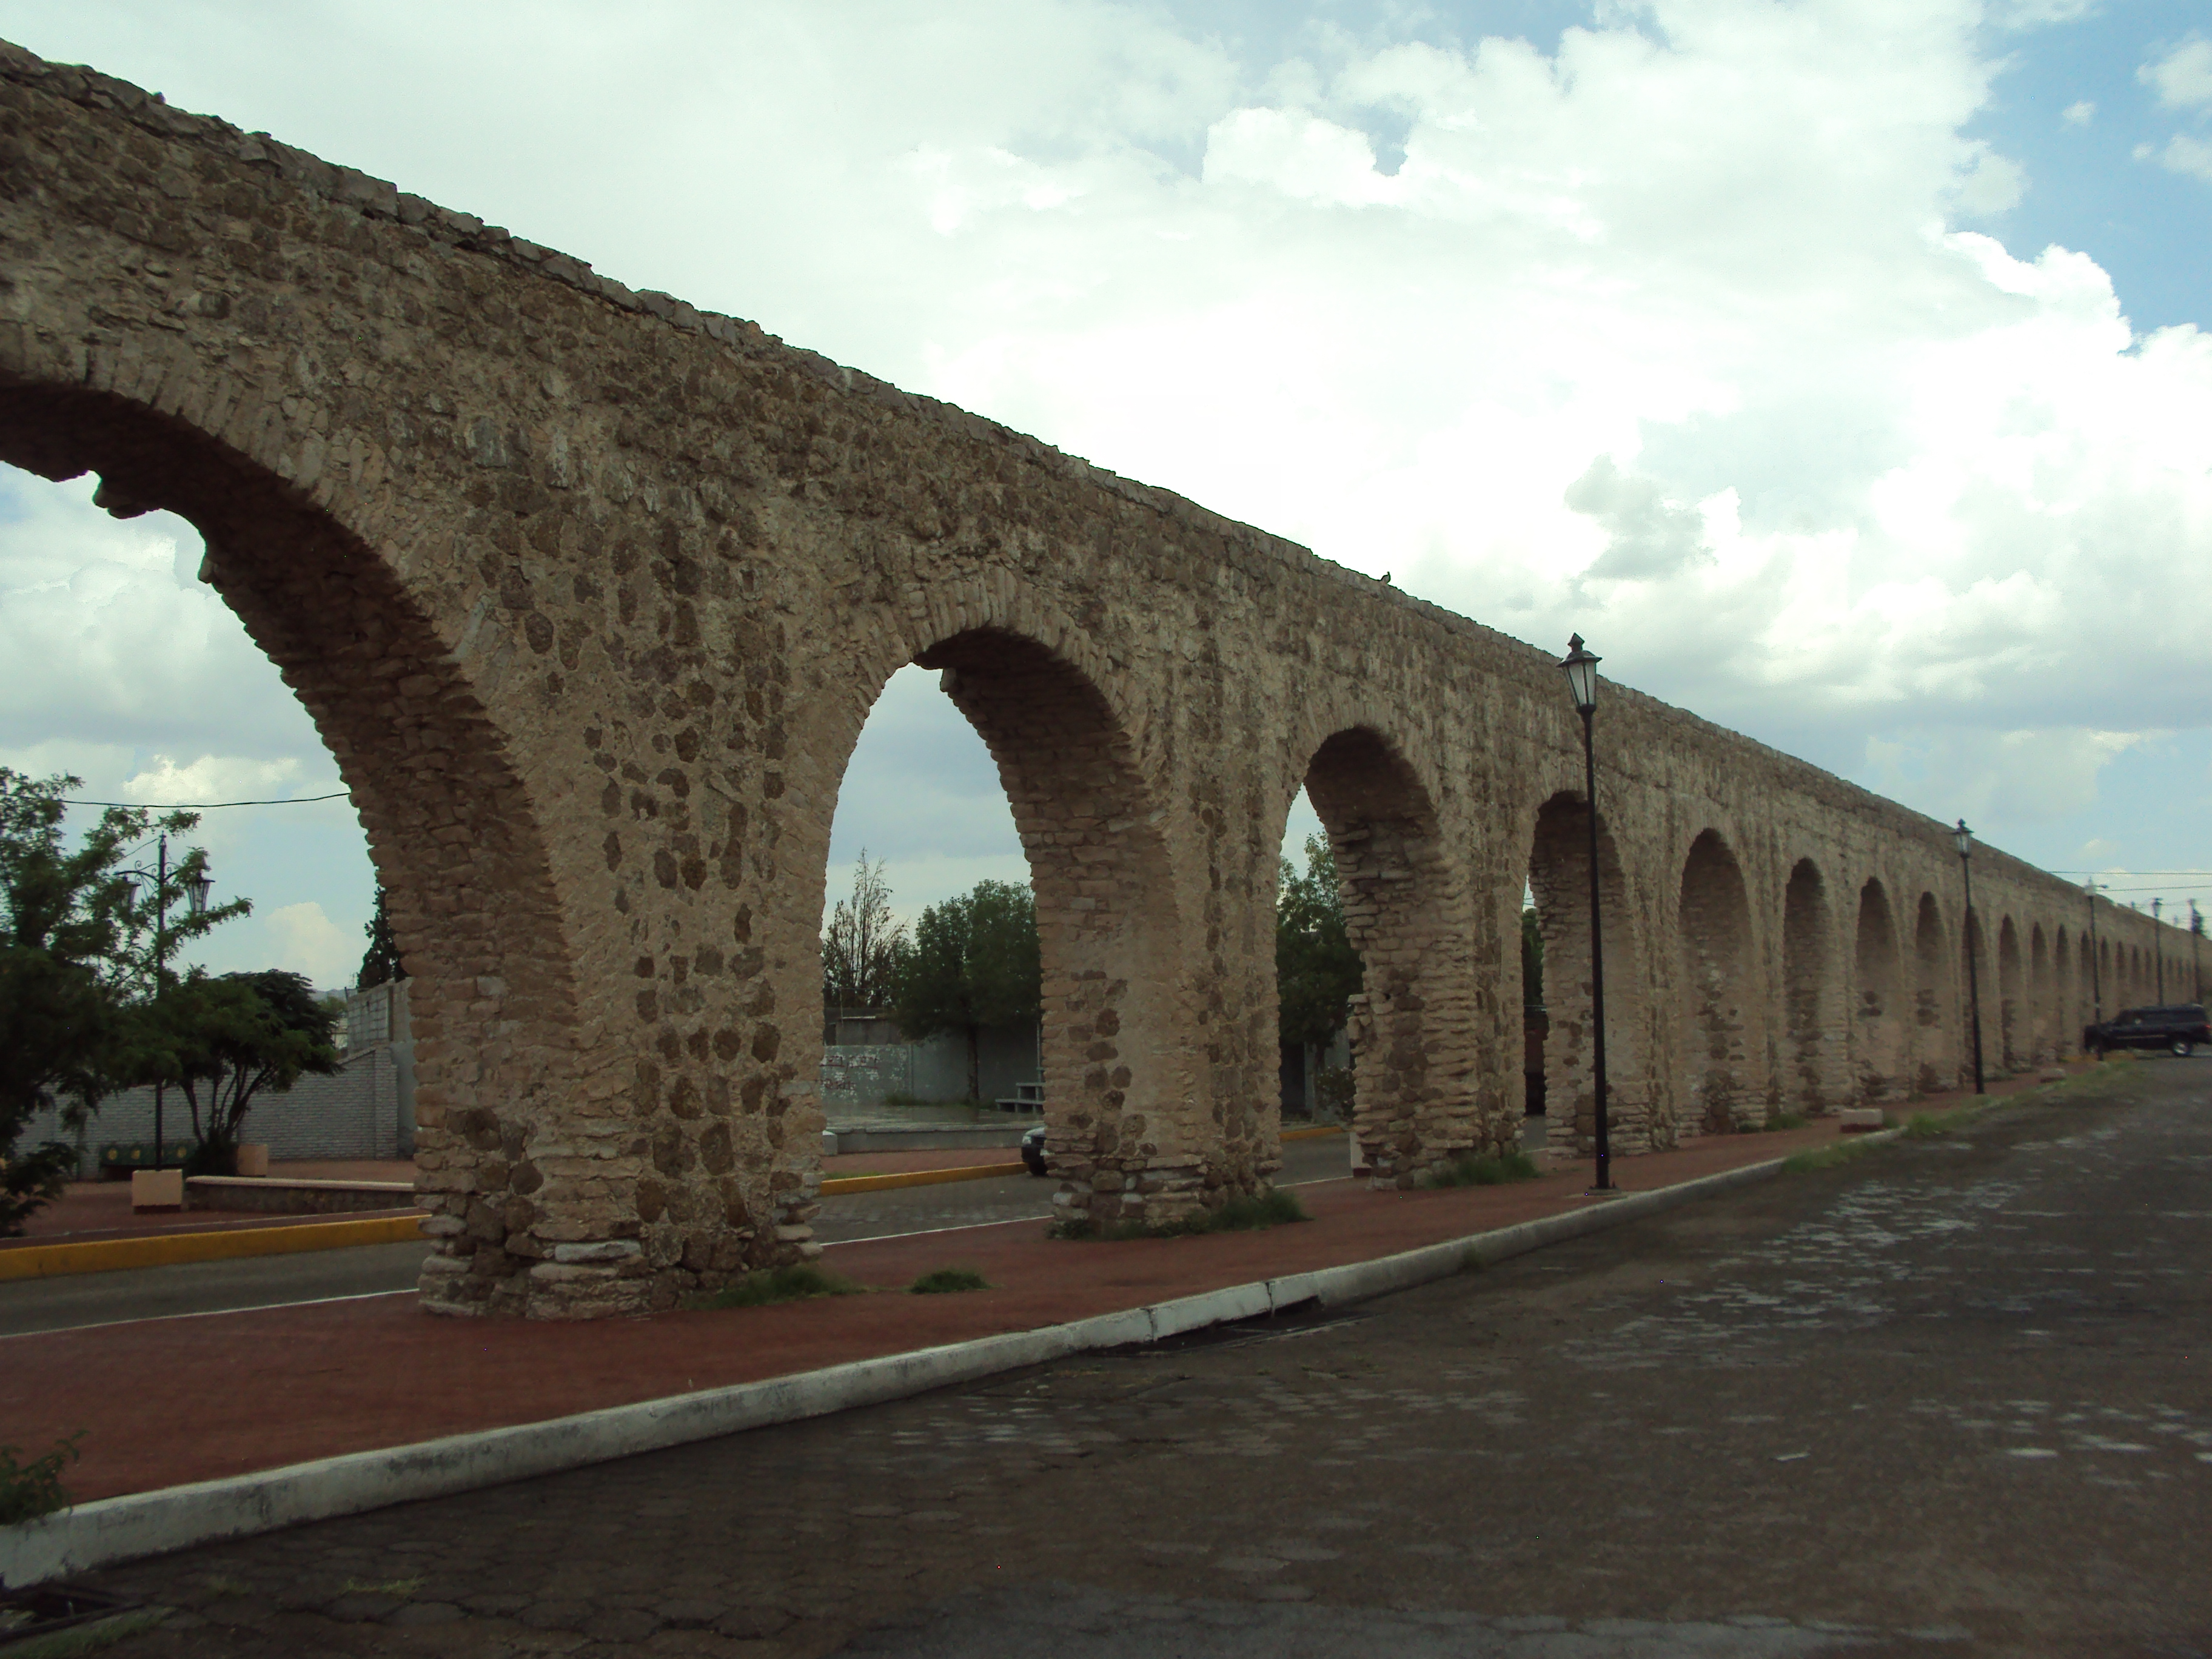 File:Acueducto de Chihuahua - 01.JPG - Wikimedia Commons